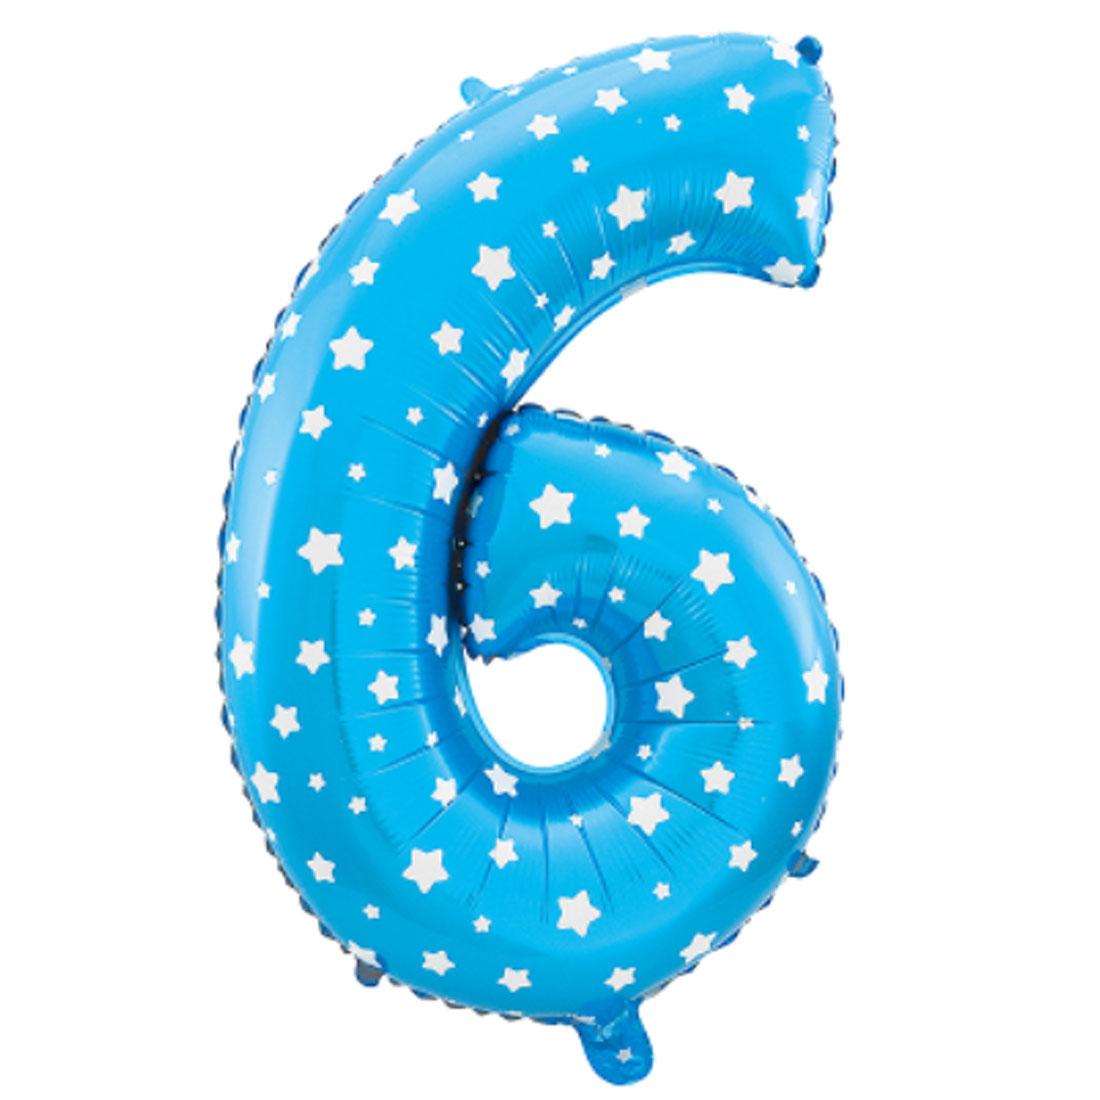 "Unique Bargains 16"" Blue Foil Number 6 Shape Balloon Helium Birthday Wedding Decor"